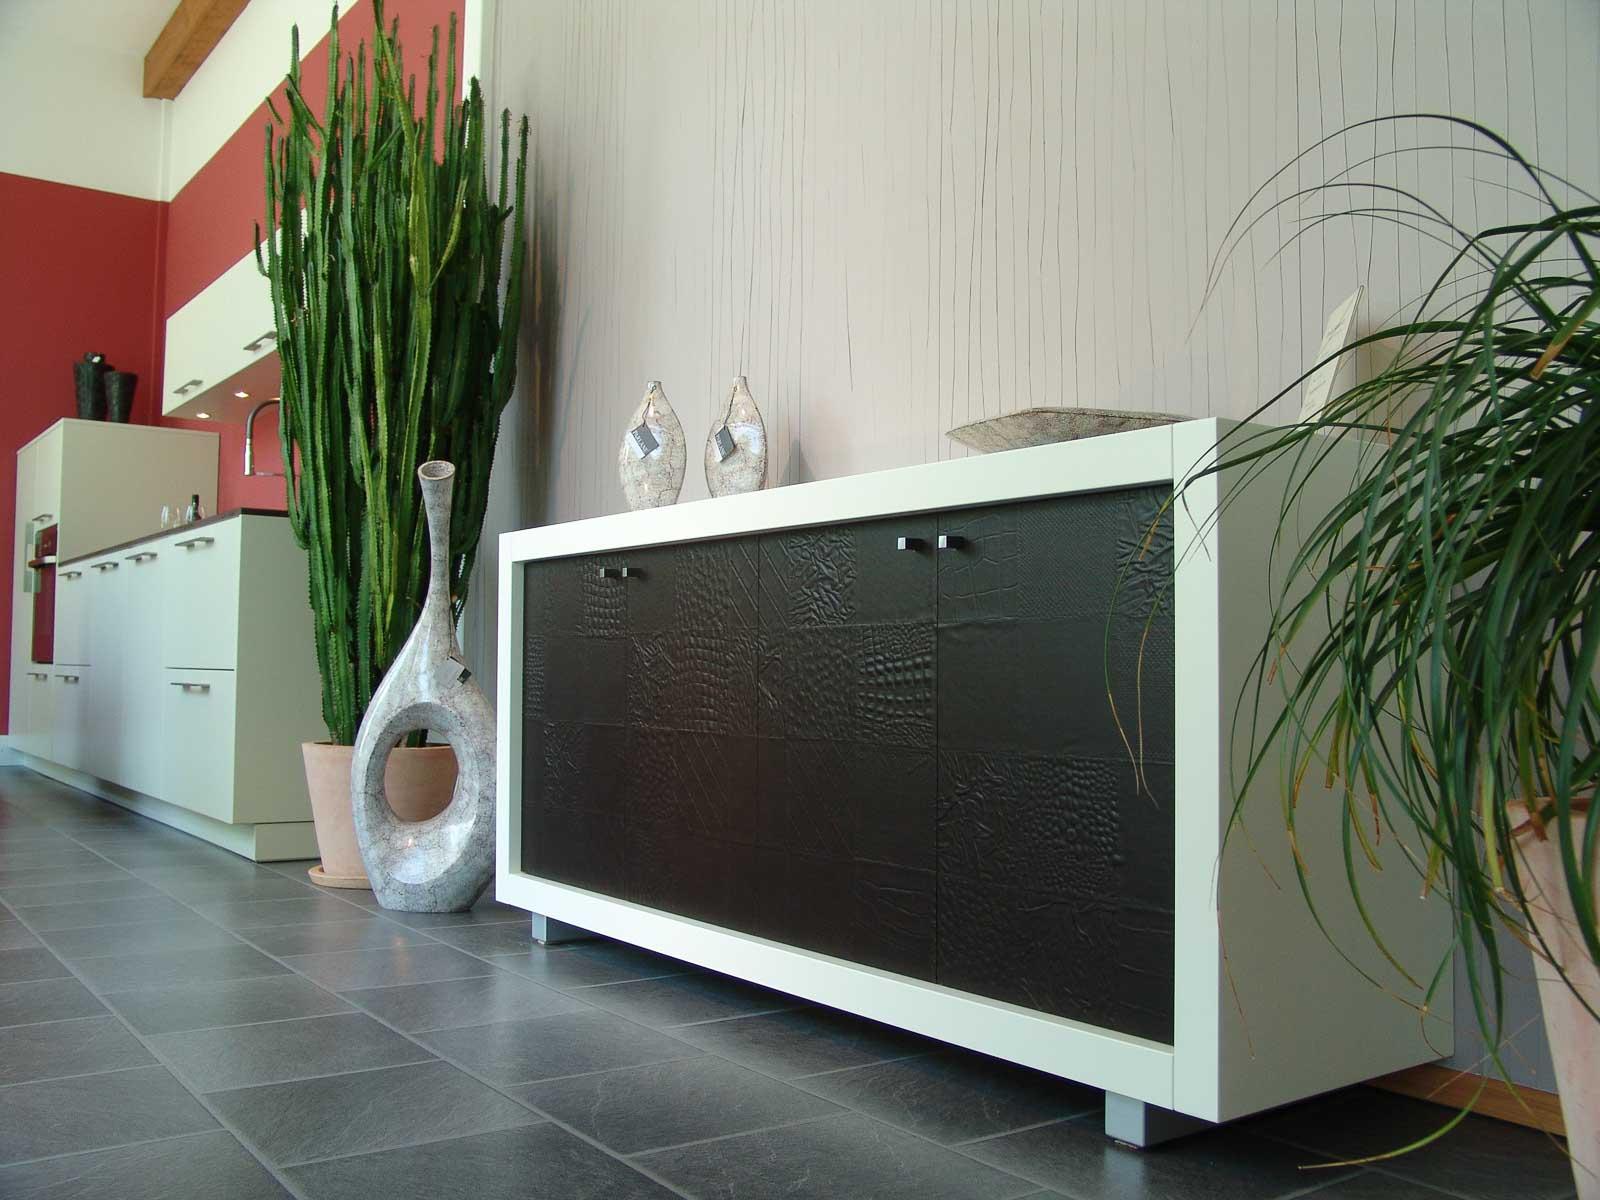 Jödicke Design - Sideboard in Lederoptik - weiß, matt lackiert